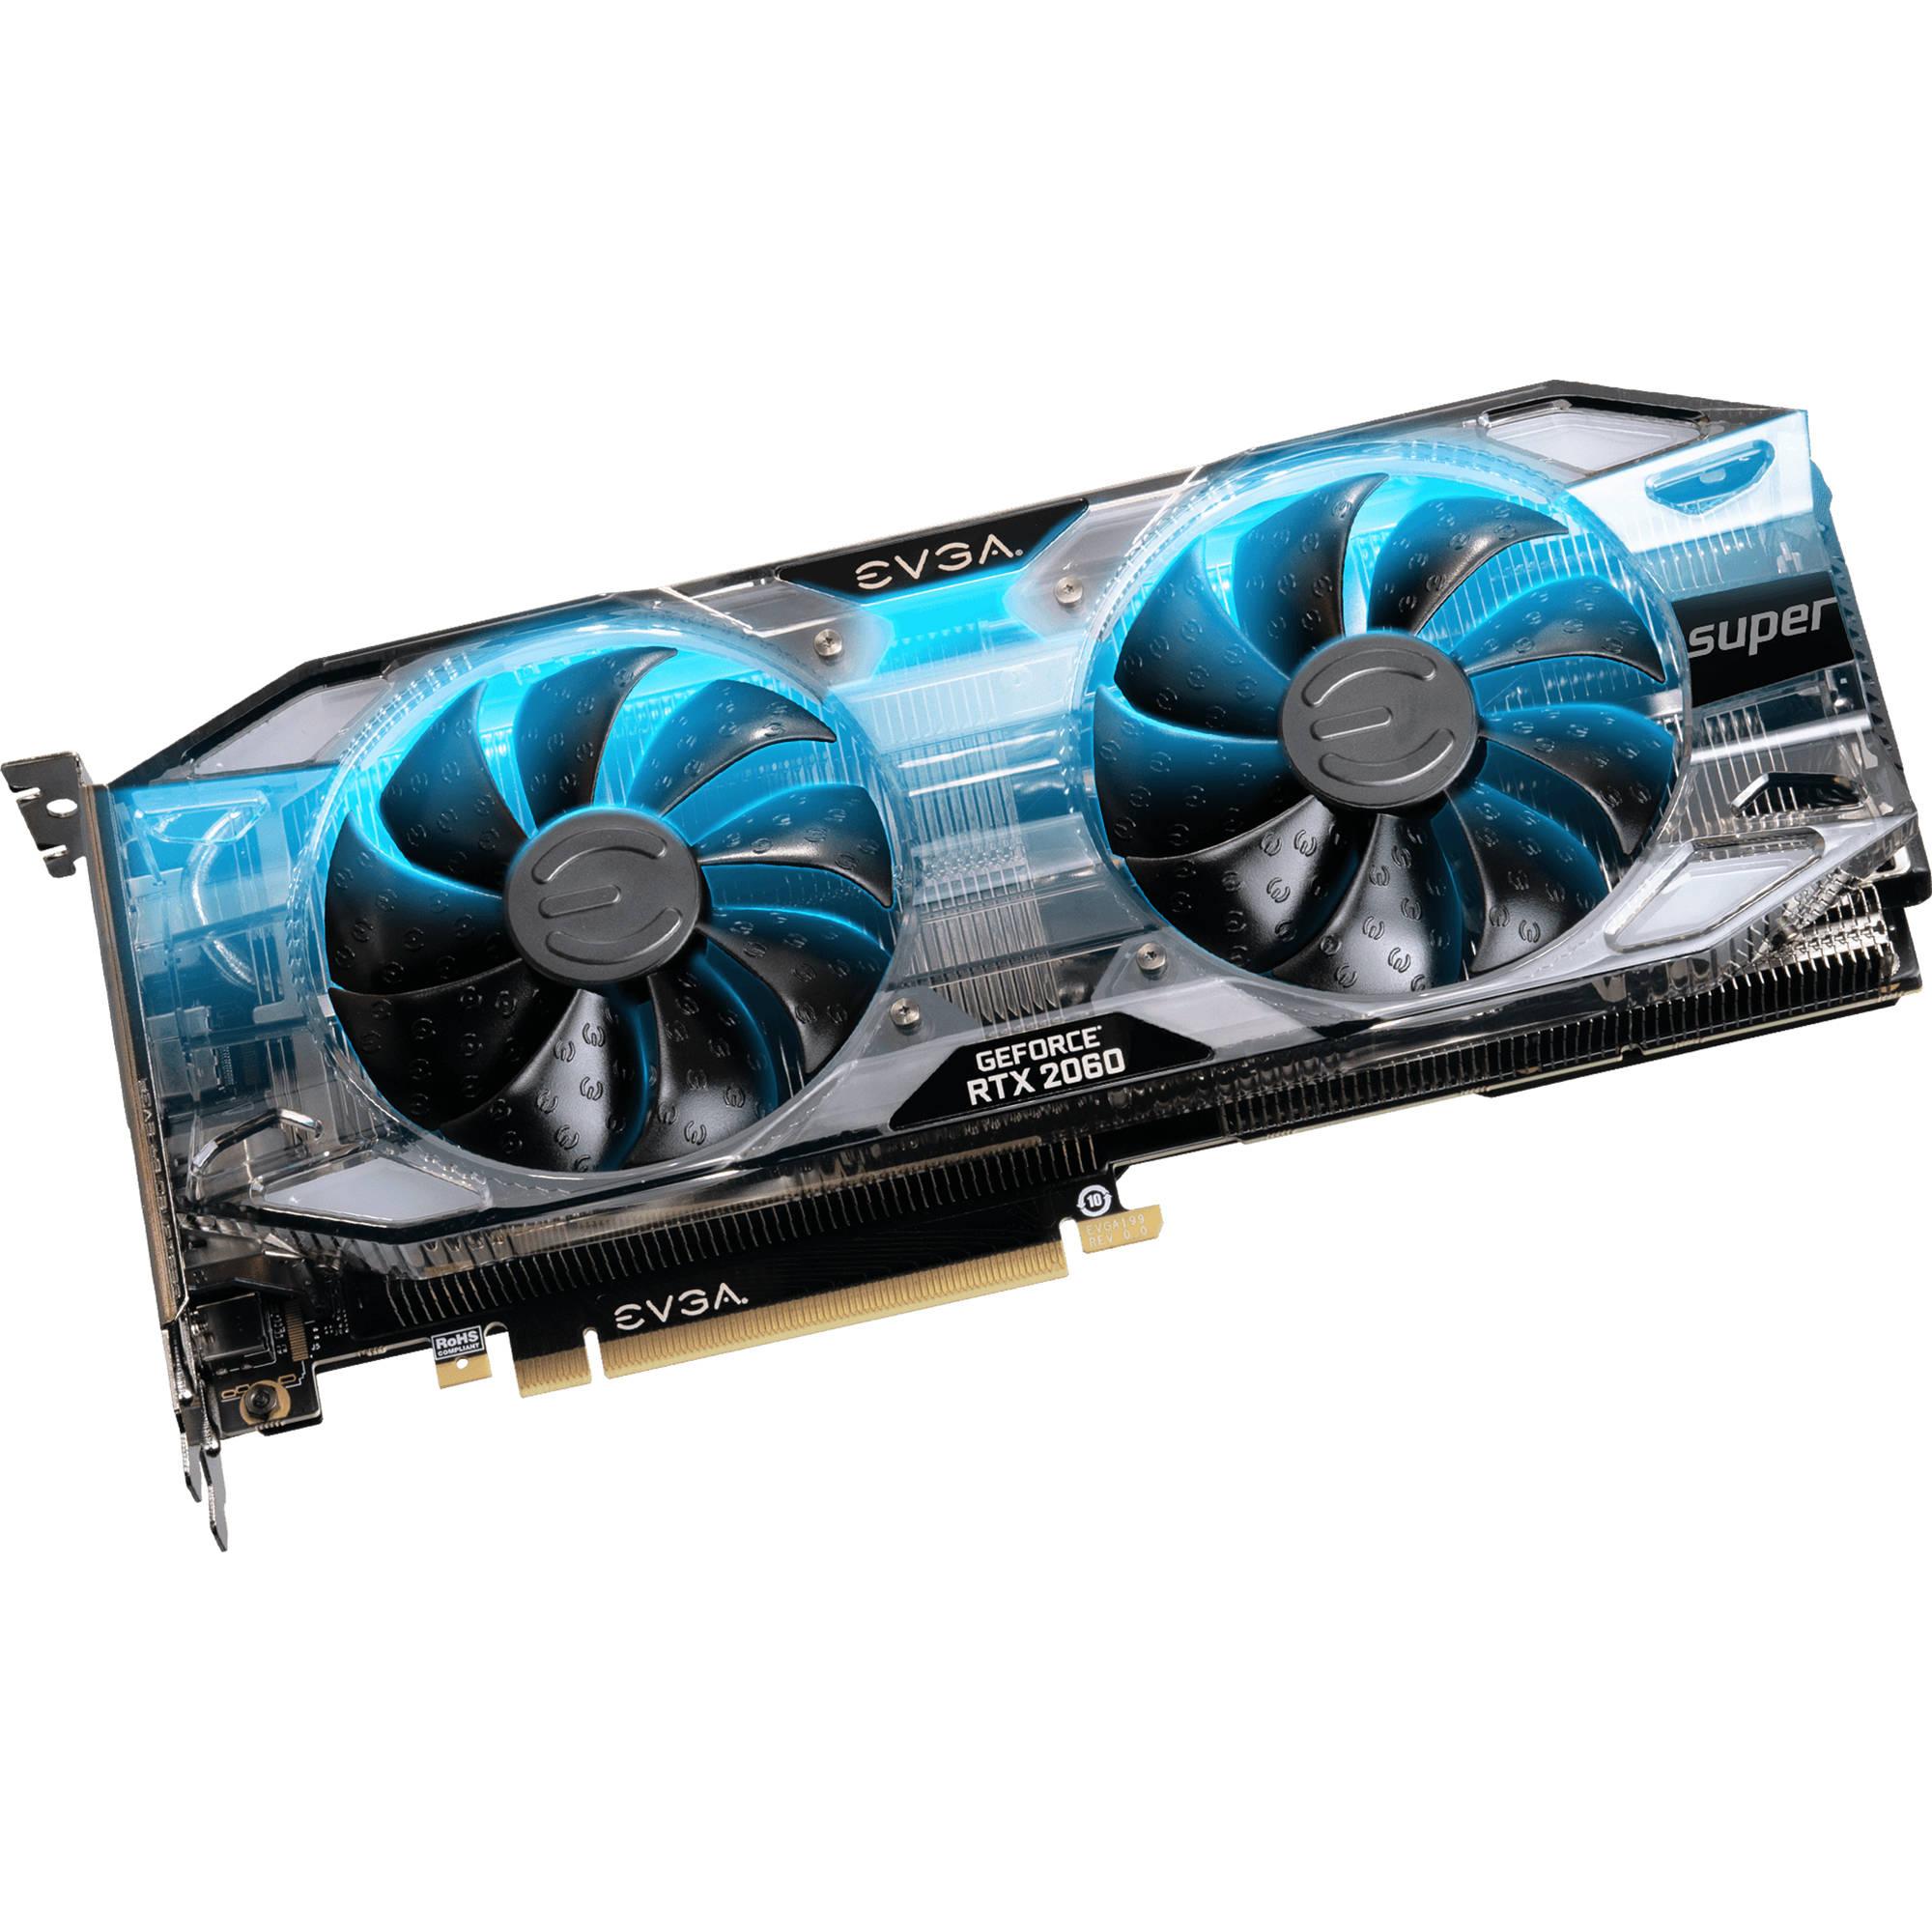 EVGA GeForce RTX 2060 SUPER XC GAMING Graphics Card